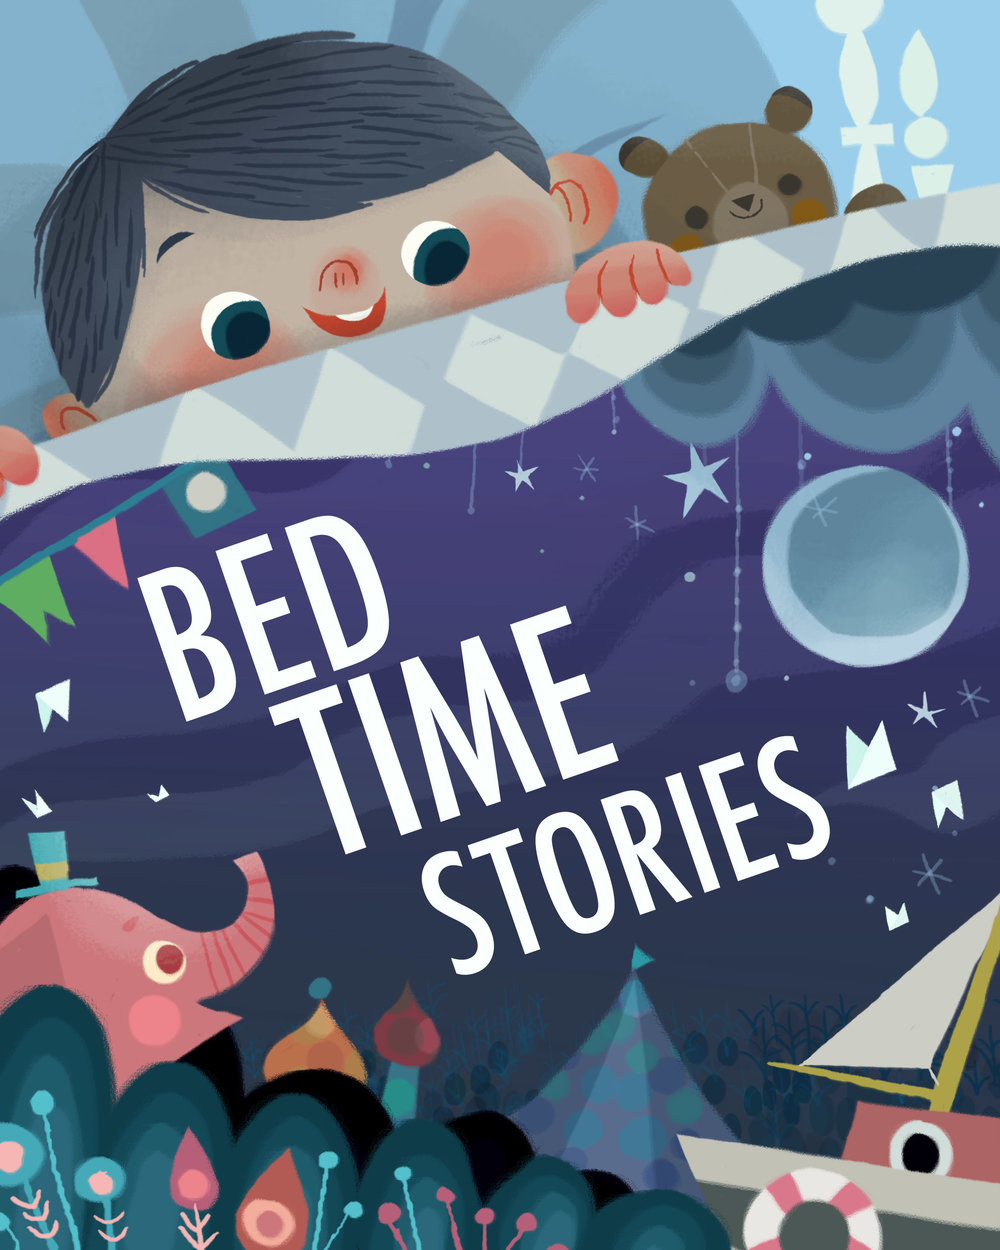 bedtime_promo.jpg